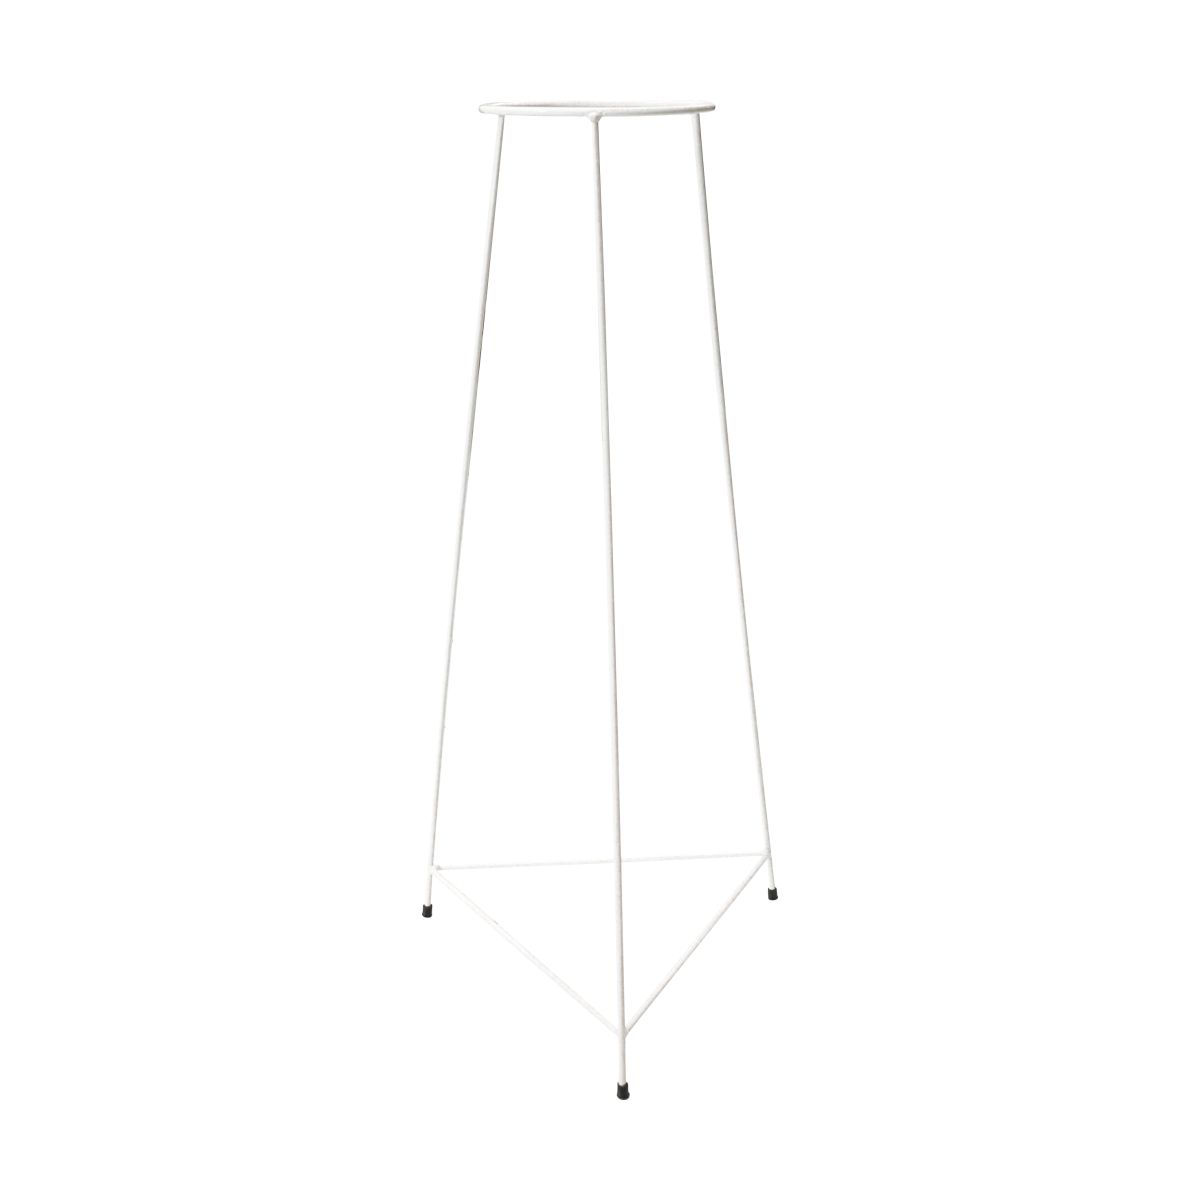 Suporte Tripé Triangular Branco 90cm para Vaso Autoirigável Grande N04 Raiz